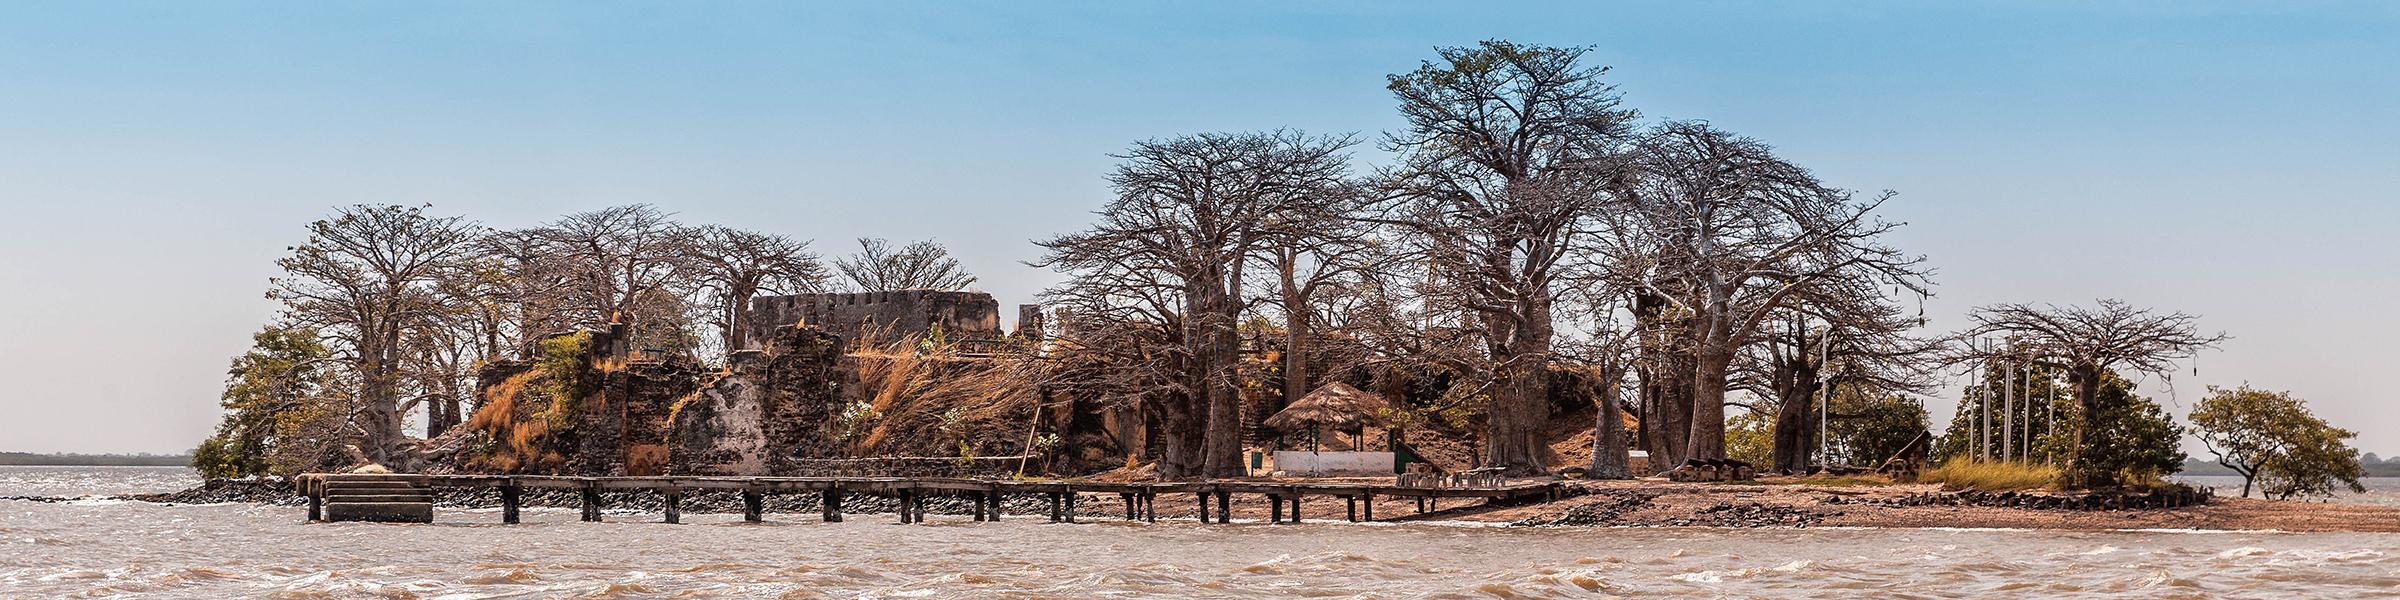 Gambia River Kunta Kinteh Island